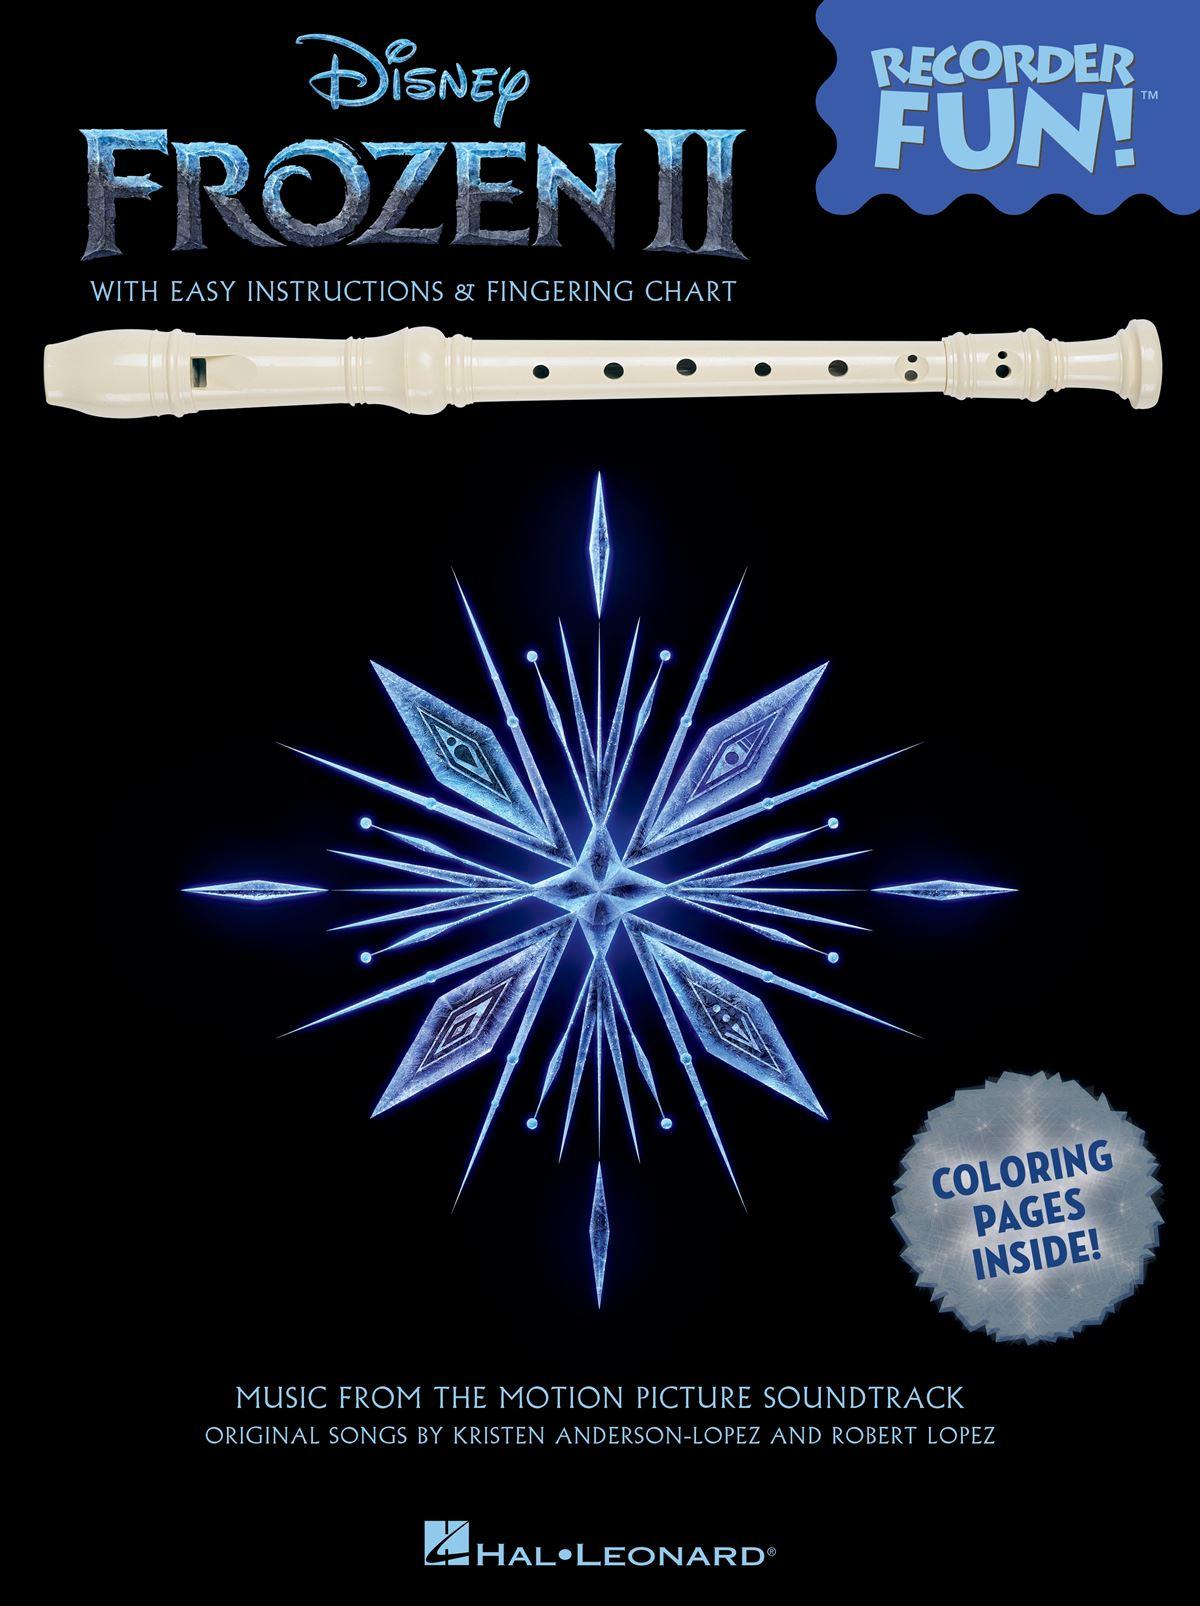 Kristen Anderson-Lopez Robert Lopez: Frozen 2 - Recorder Fun!: Recorder: Album